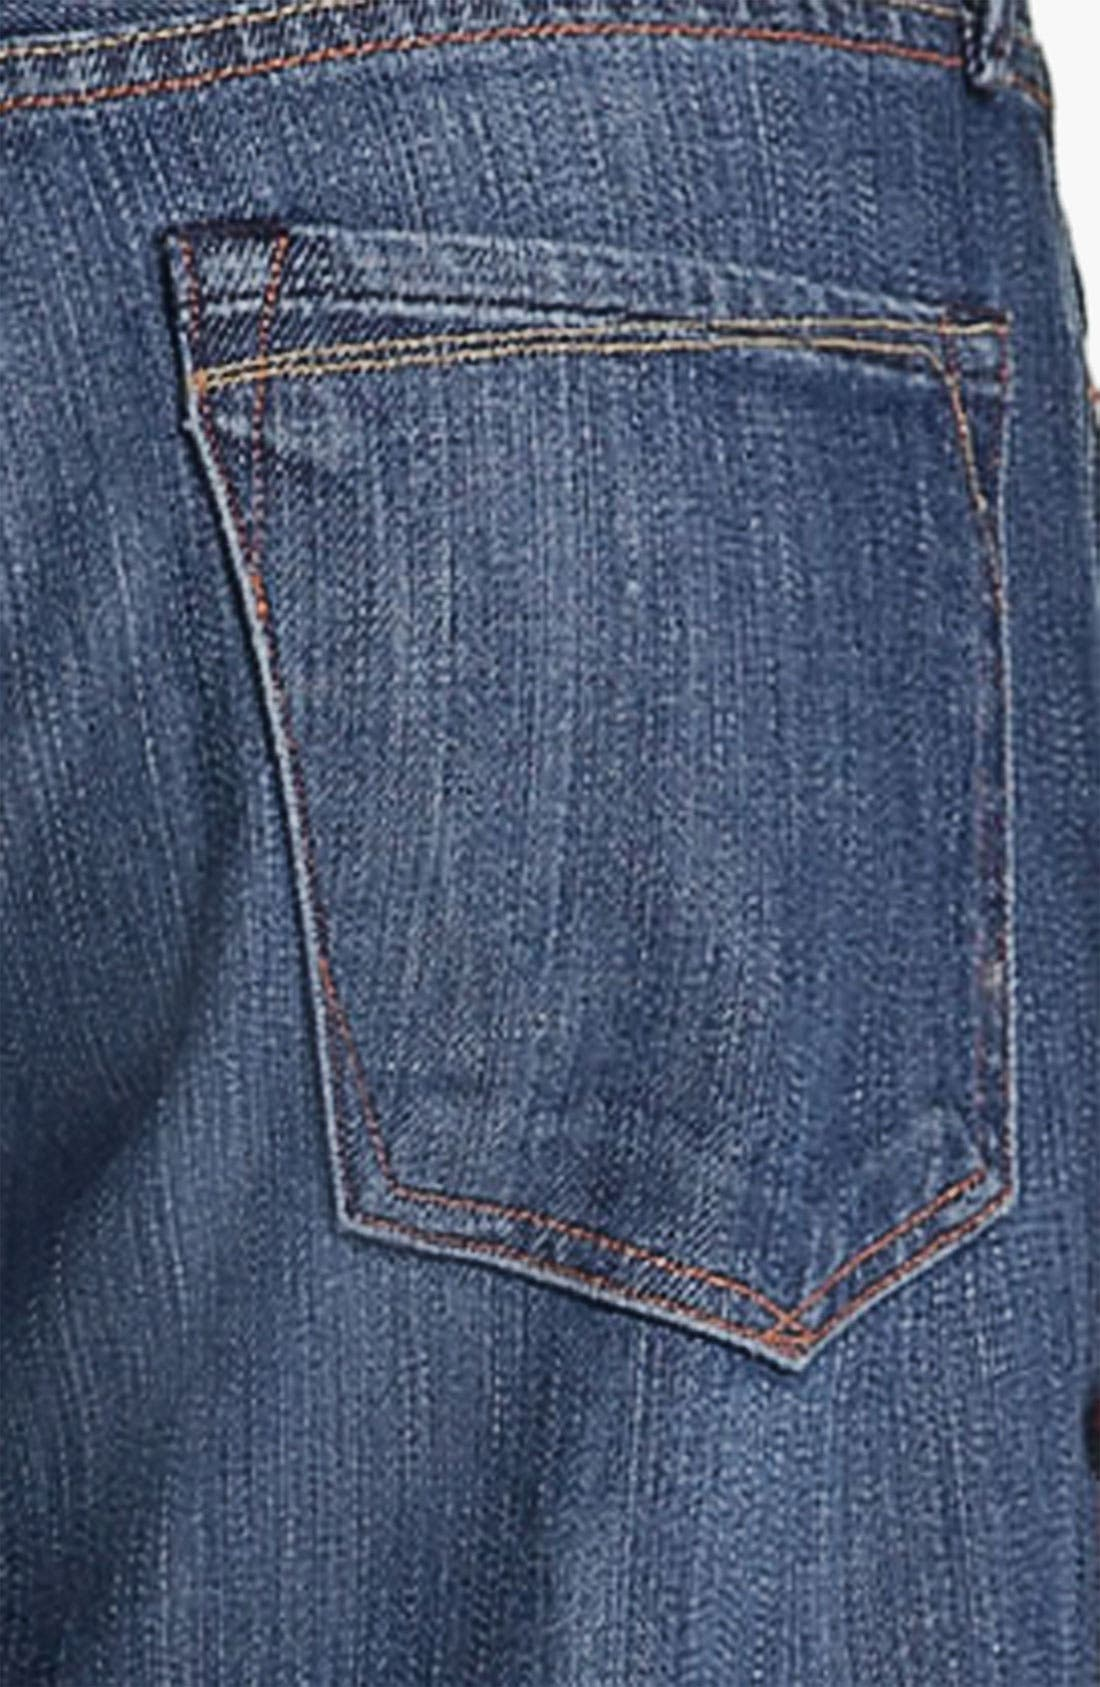 Alternate Image 4  - Earnest Sewn 'Dexter' Relaxed Leg Jeans (Burton)